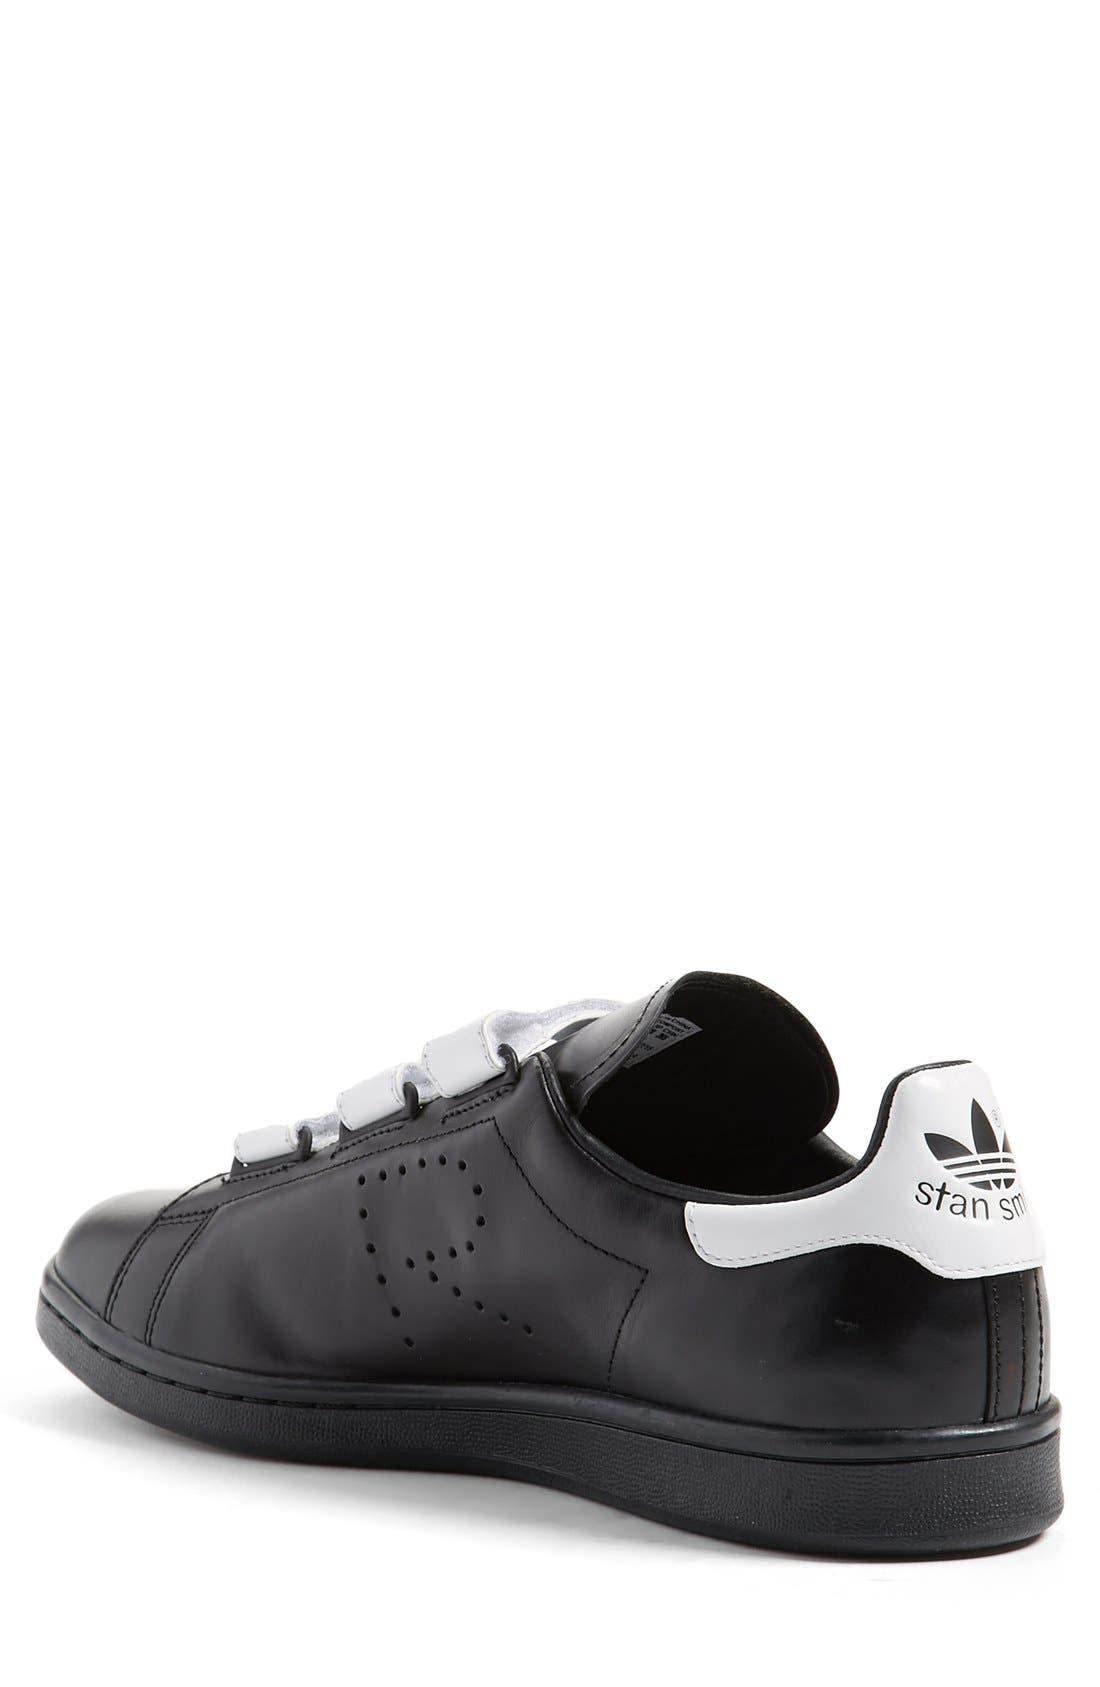 RAF SIMONS,                             adidas by Raf Simons 'Stan Smith' Sneaker,                             Alternate thumbnail 3, color,                             001